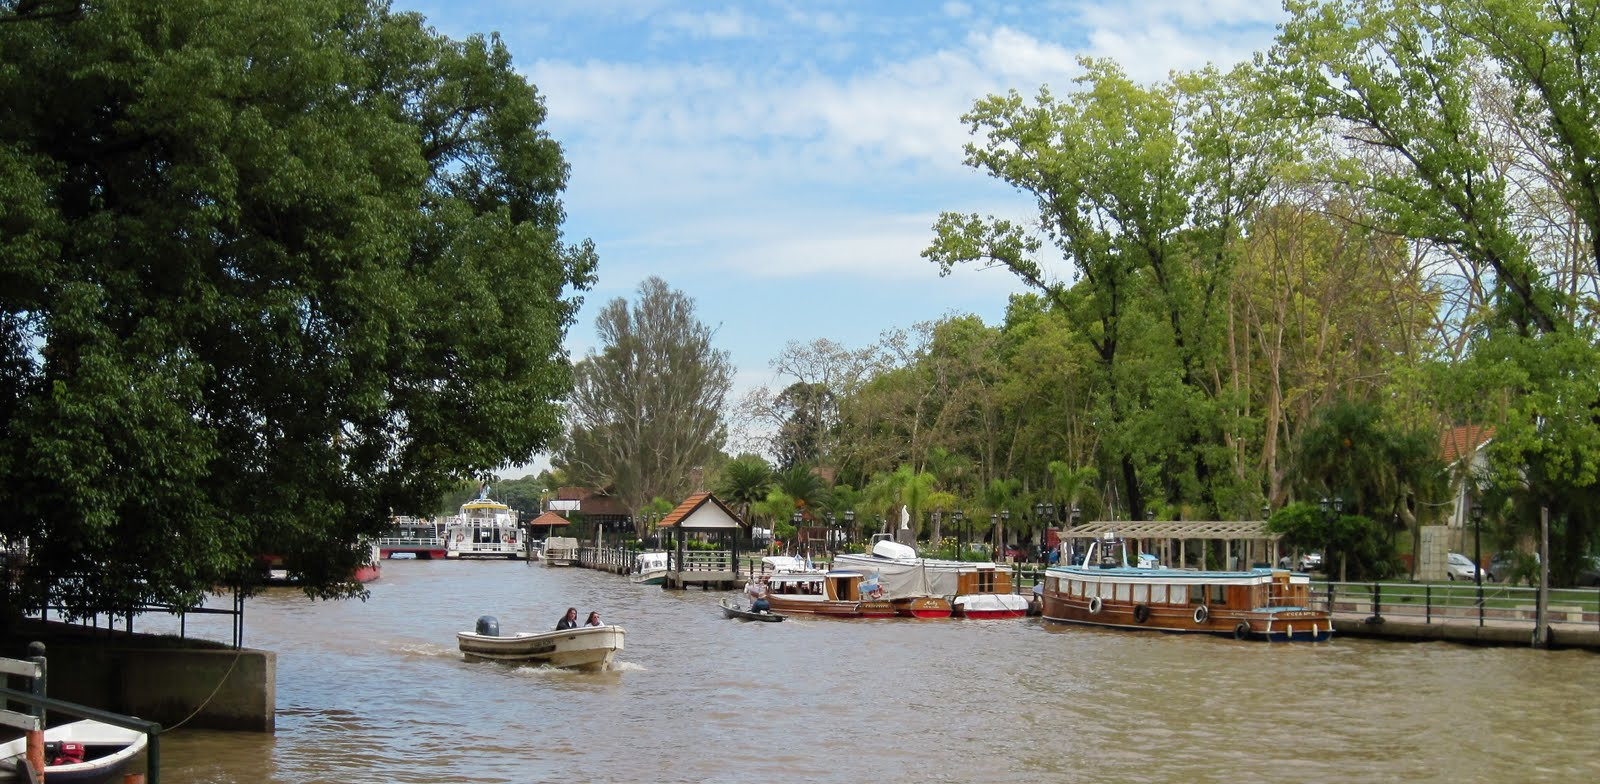 Tigre Argentina  city pictures gallery : CarpeSummer: El Tigre, Argentina